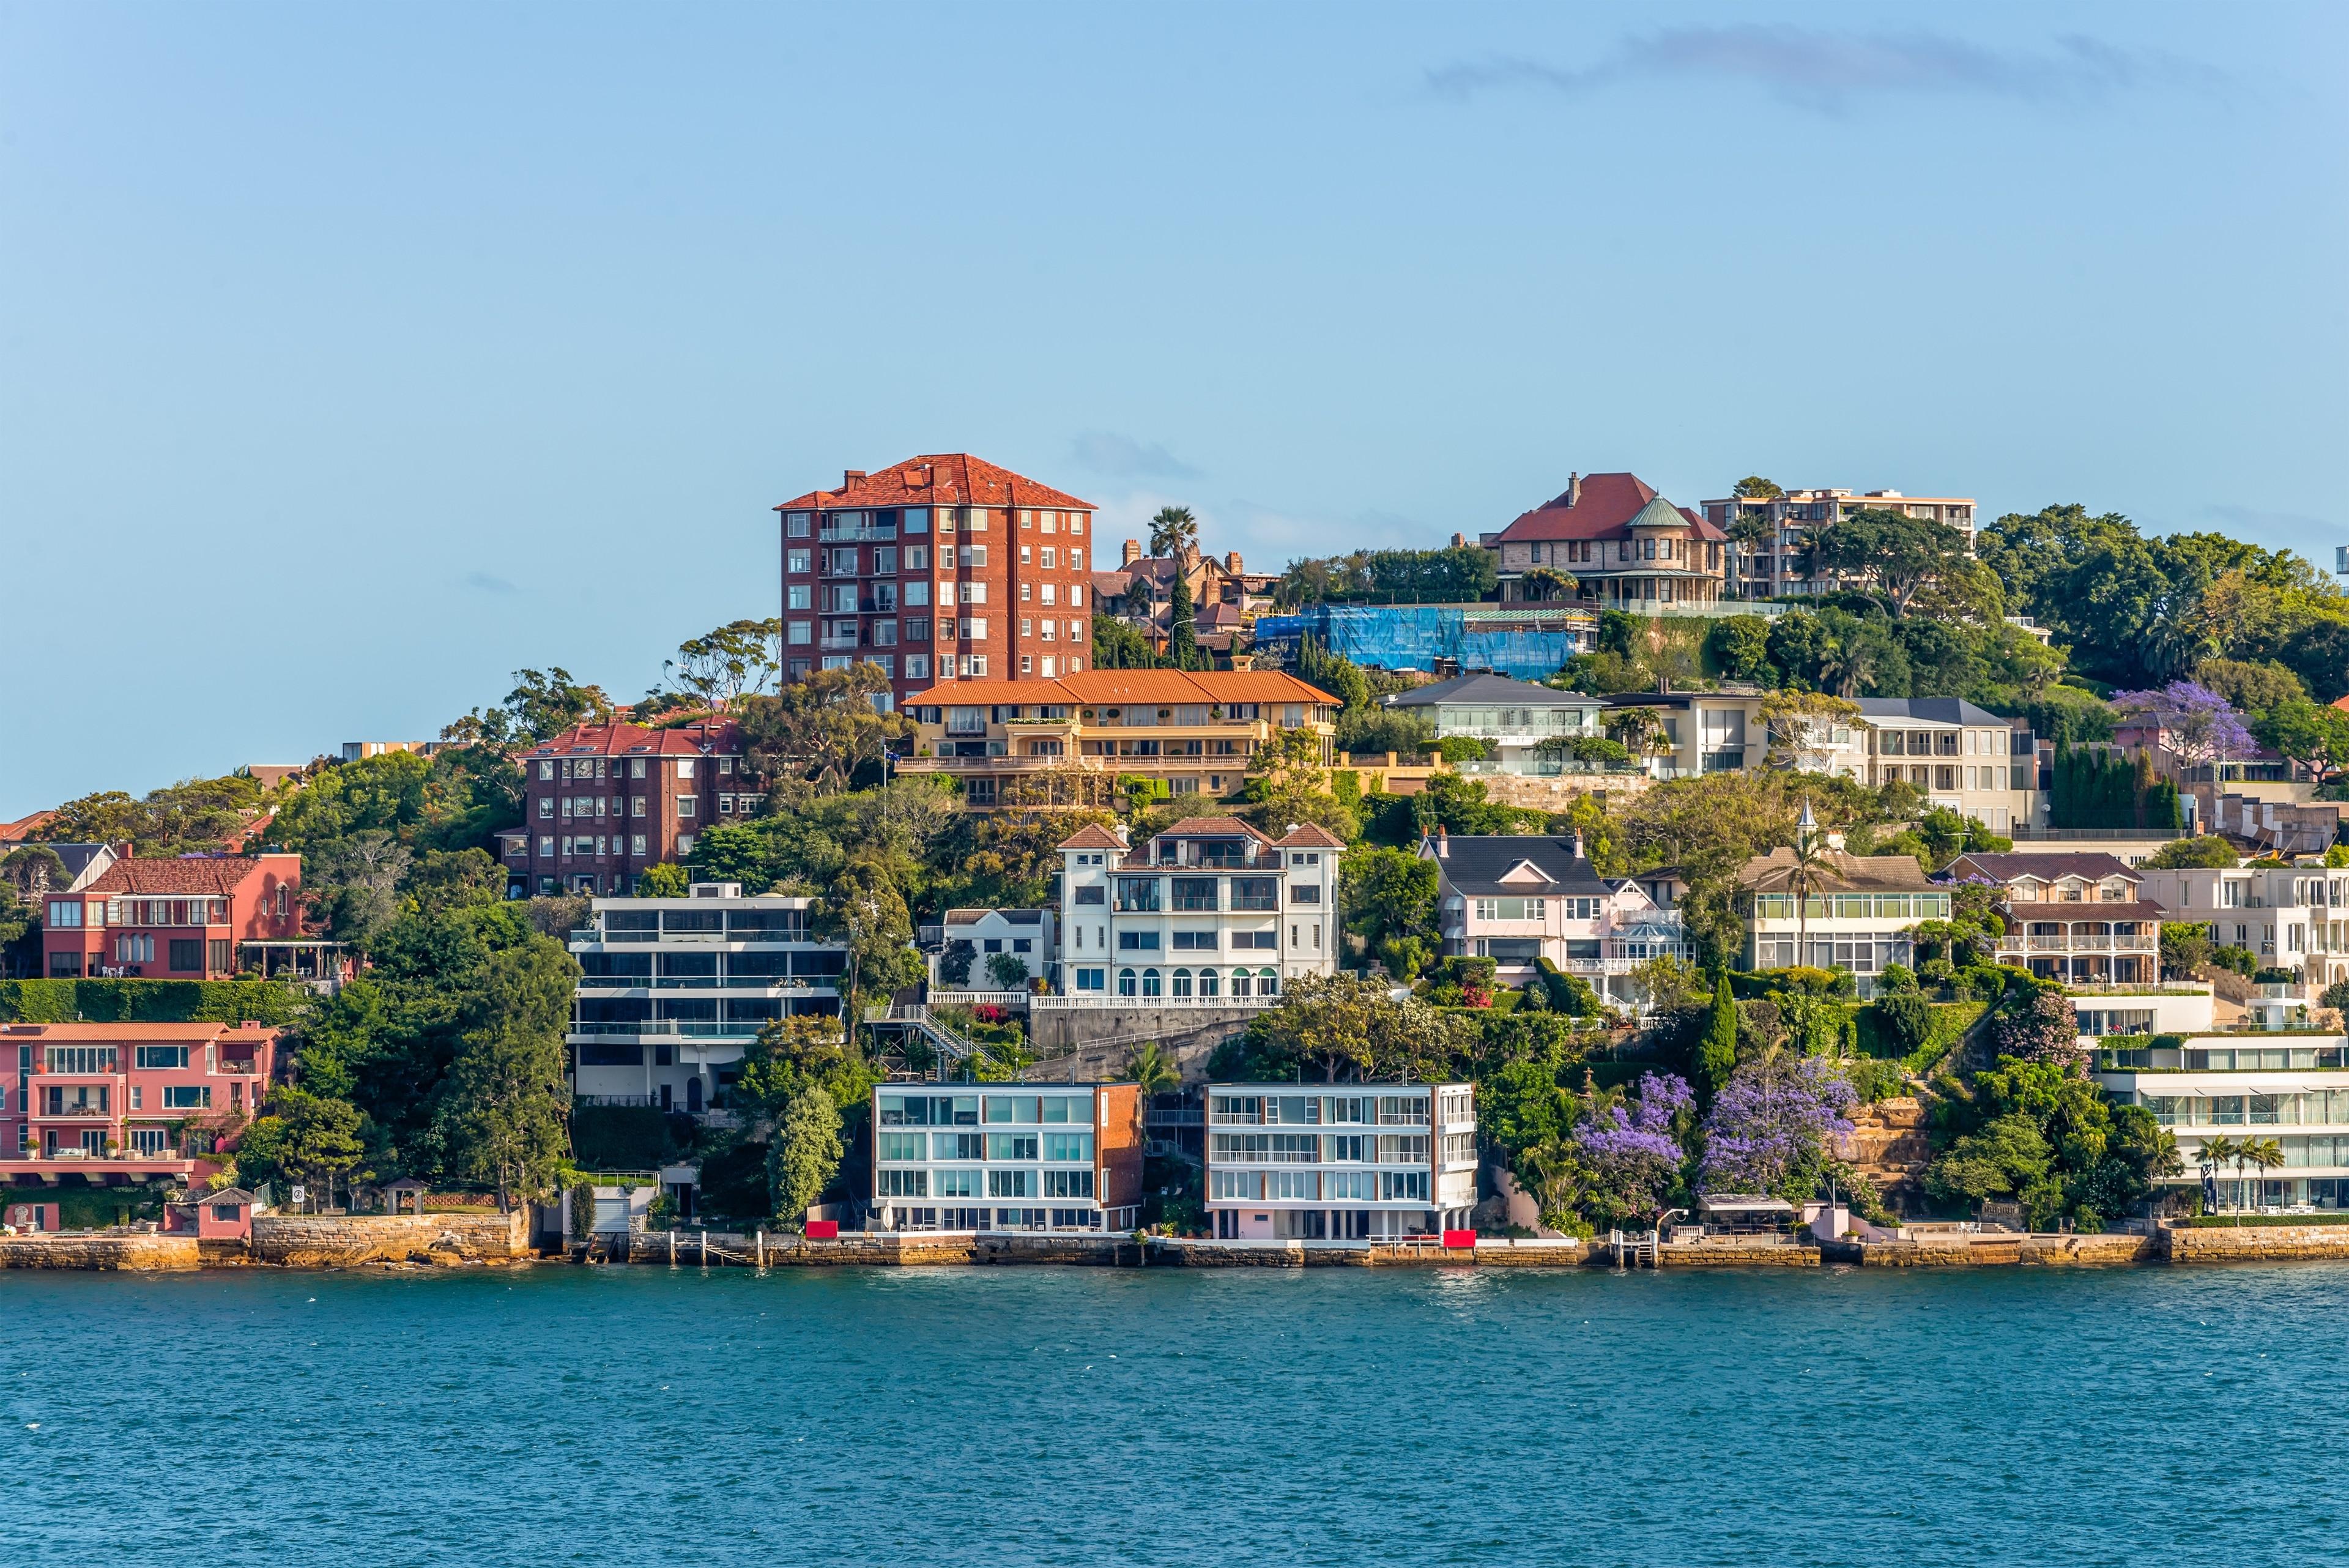 Double Bay, Sydney, New South Wales, Australia